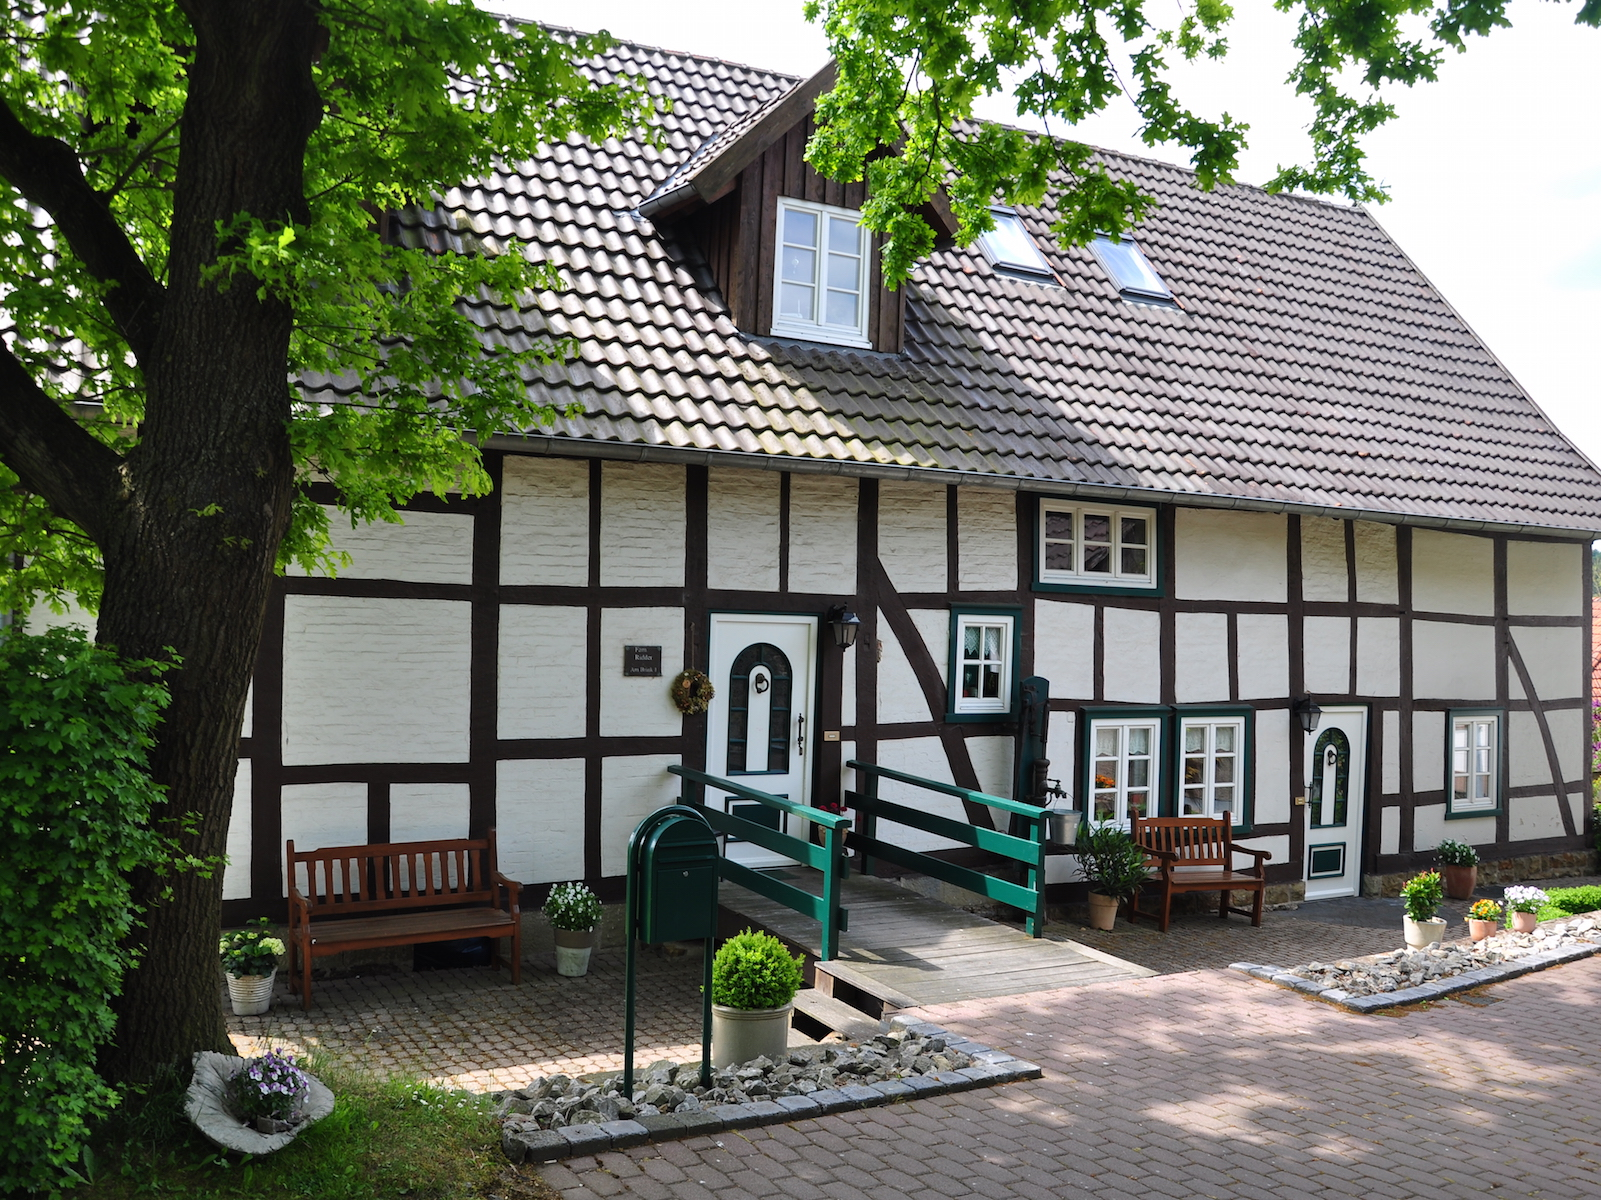 Fachwerkhaus in Kollerbeck